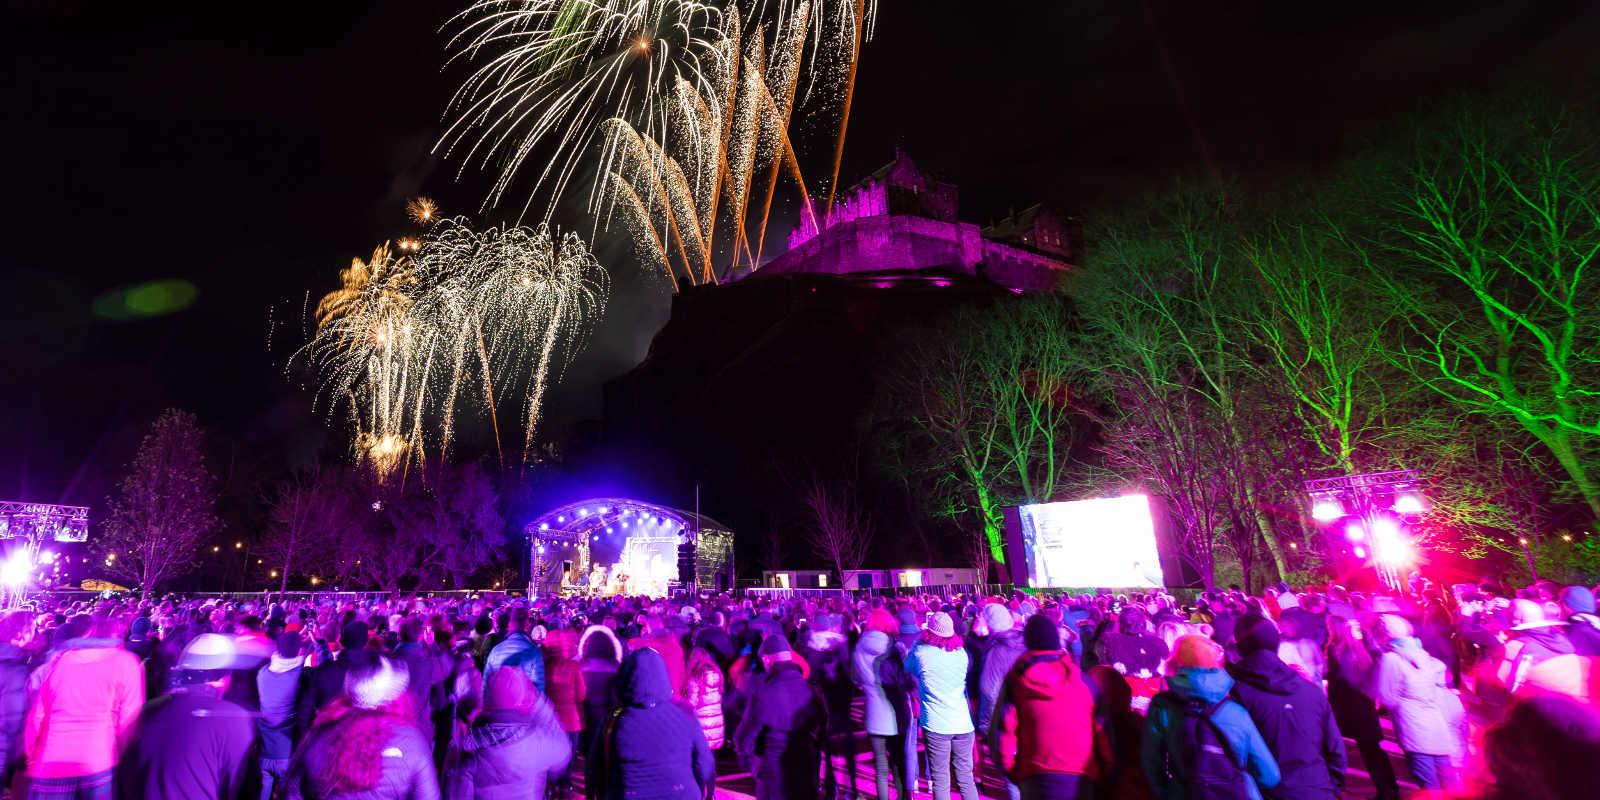 Revellers watching the fireworks above Edinburgh Castle on Hogmanay